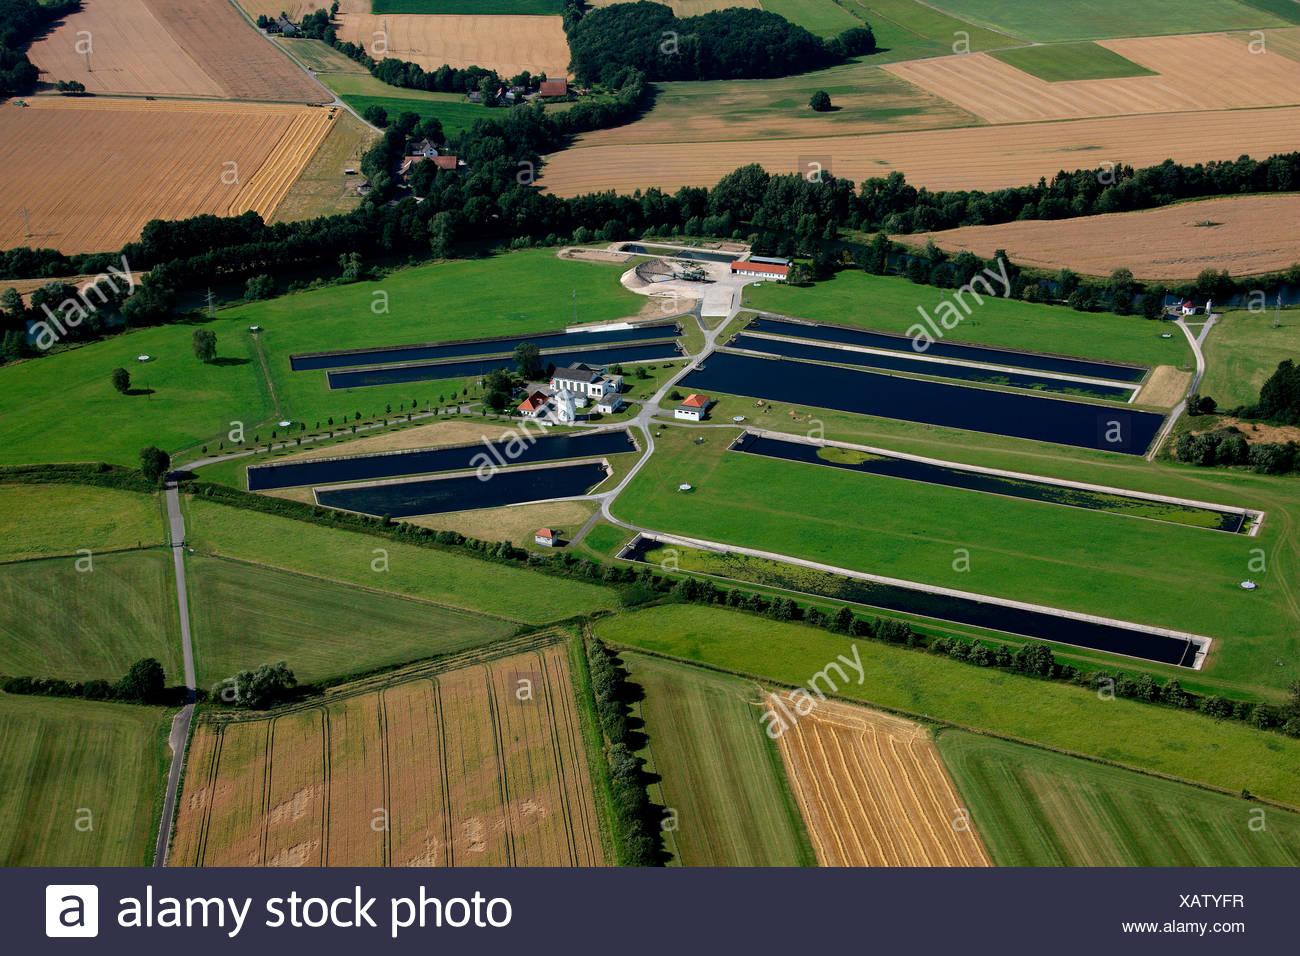 Aerial photograph, Warmen waterworks, Hamm public utility, Ruhr area, North Rhine-Westphalia, Germany, Europe Stock Photo